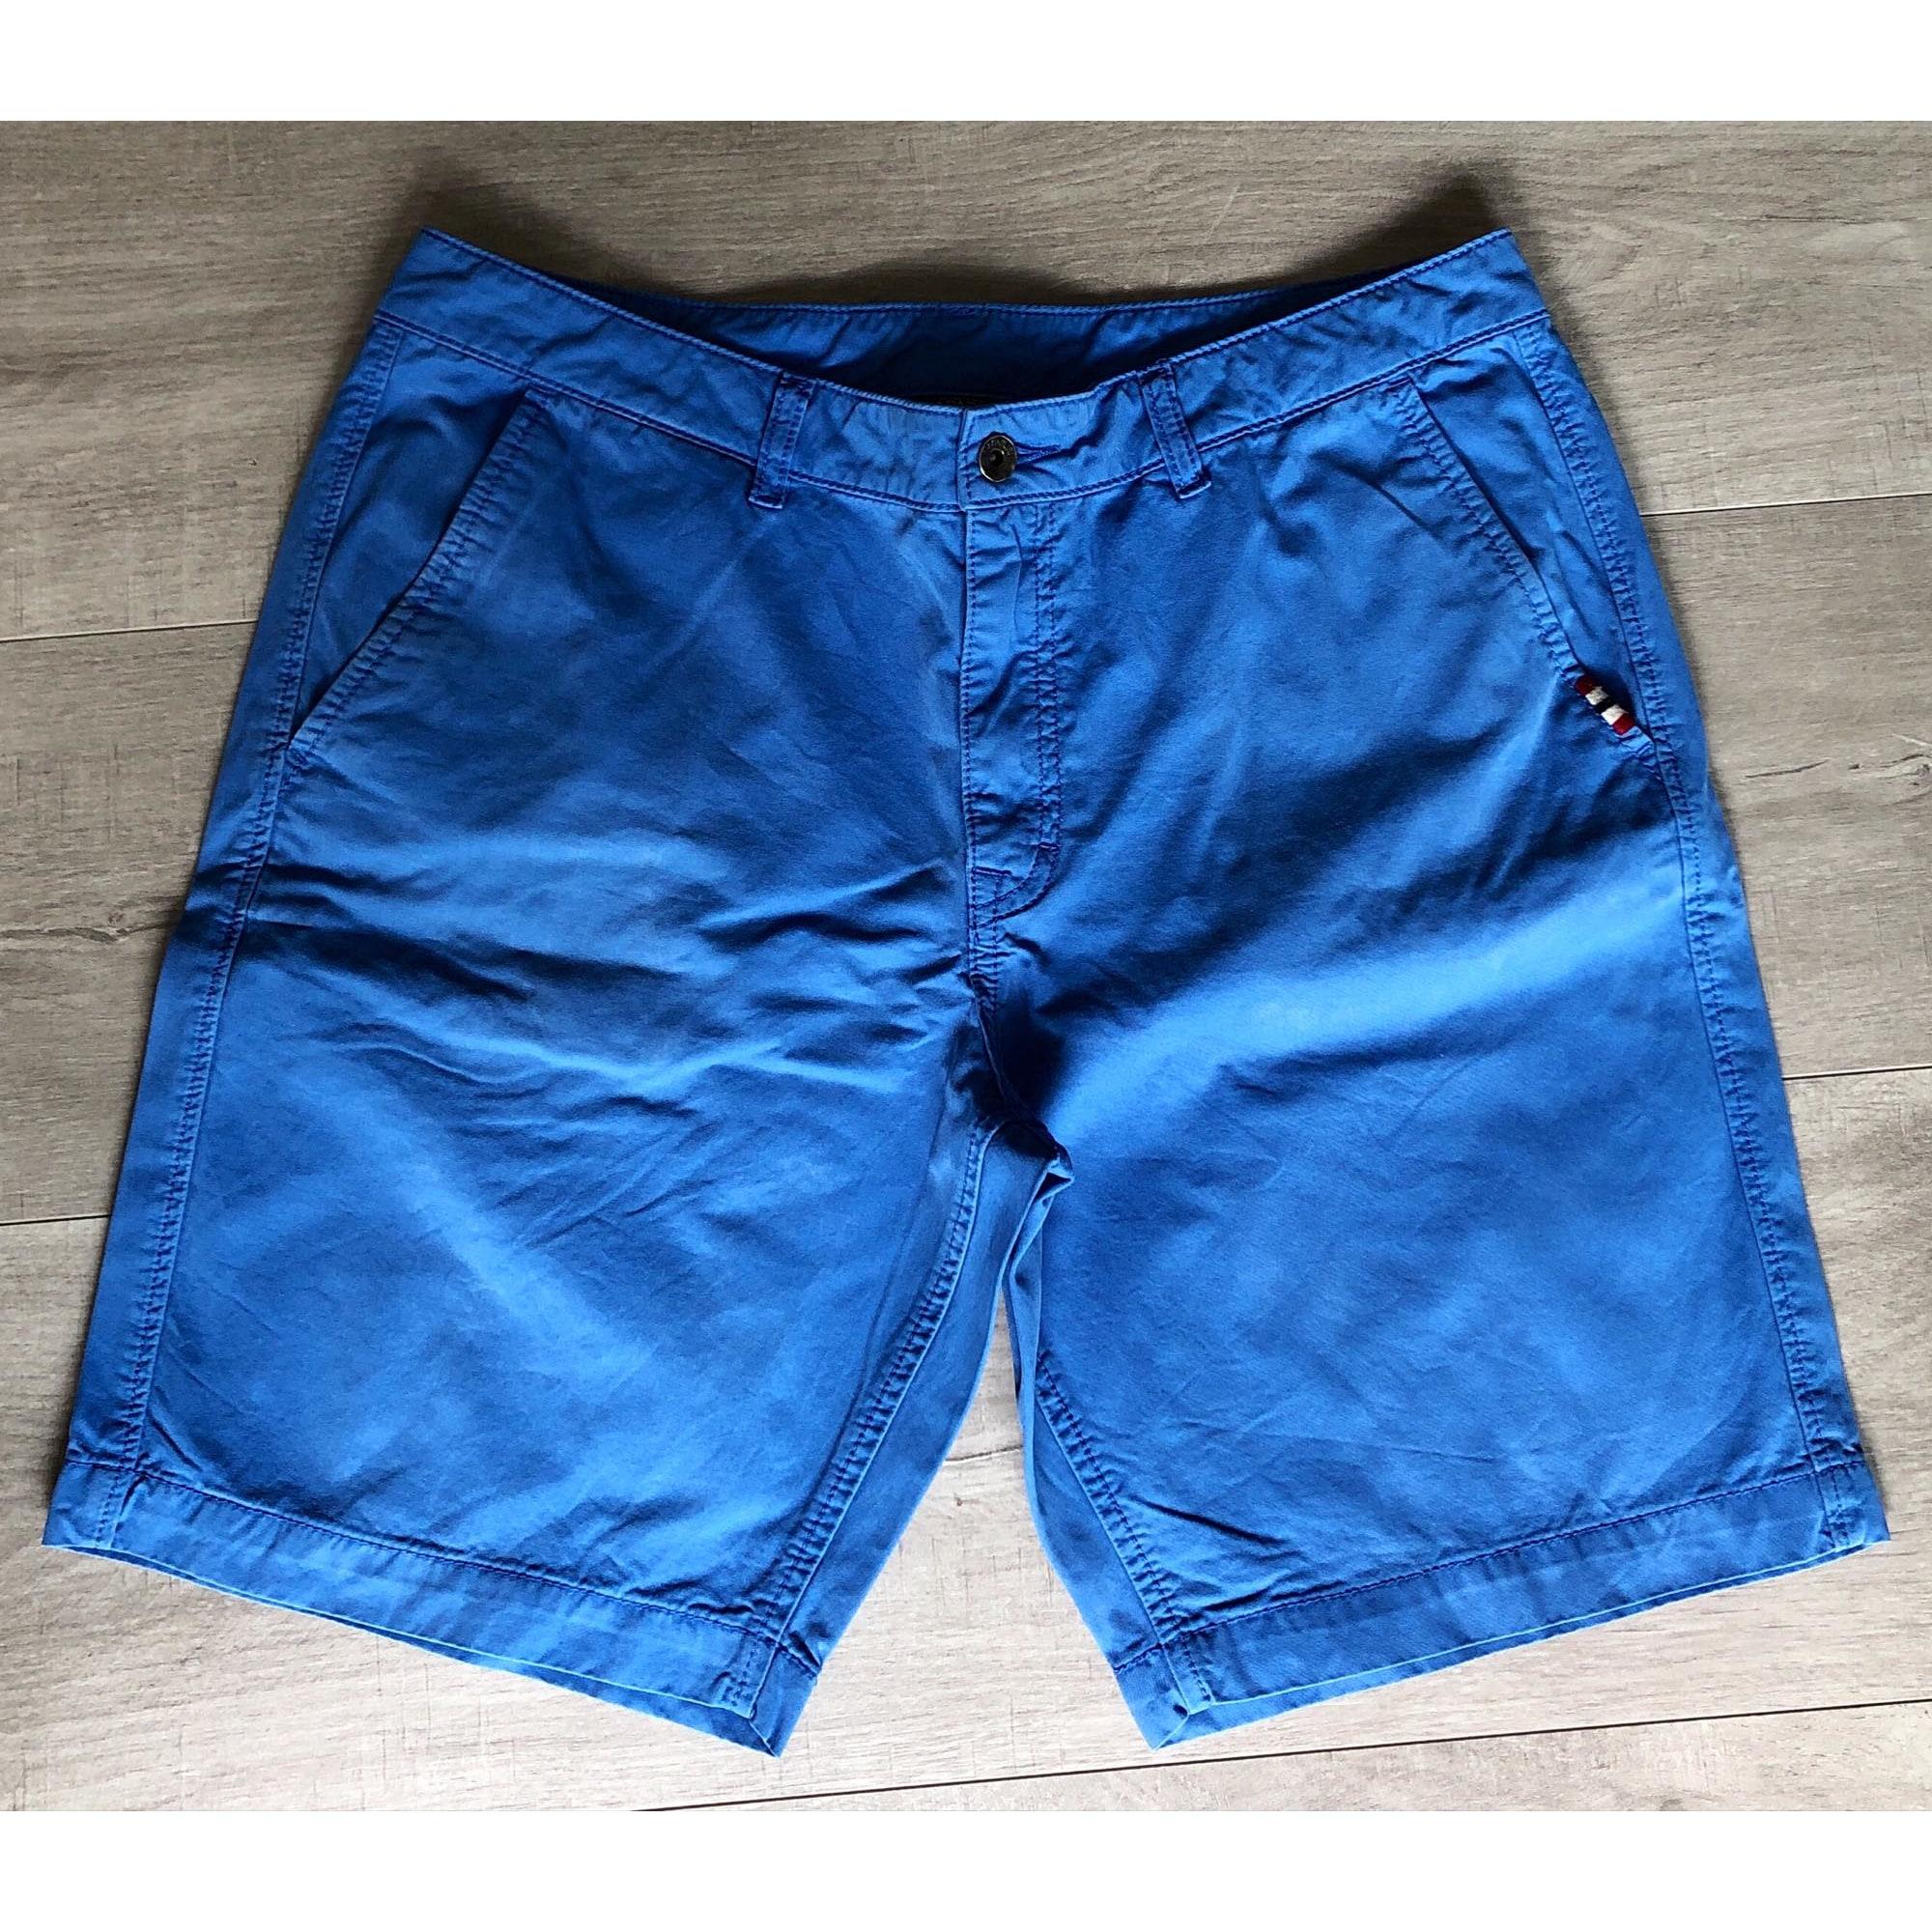 Bermuda Shorts NAPAPIJRI Blue, navy, turquoise